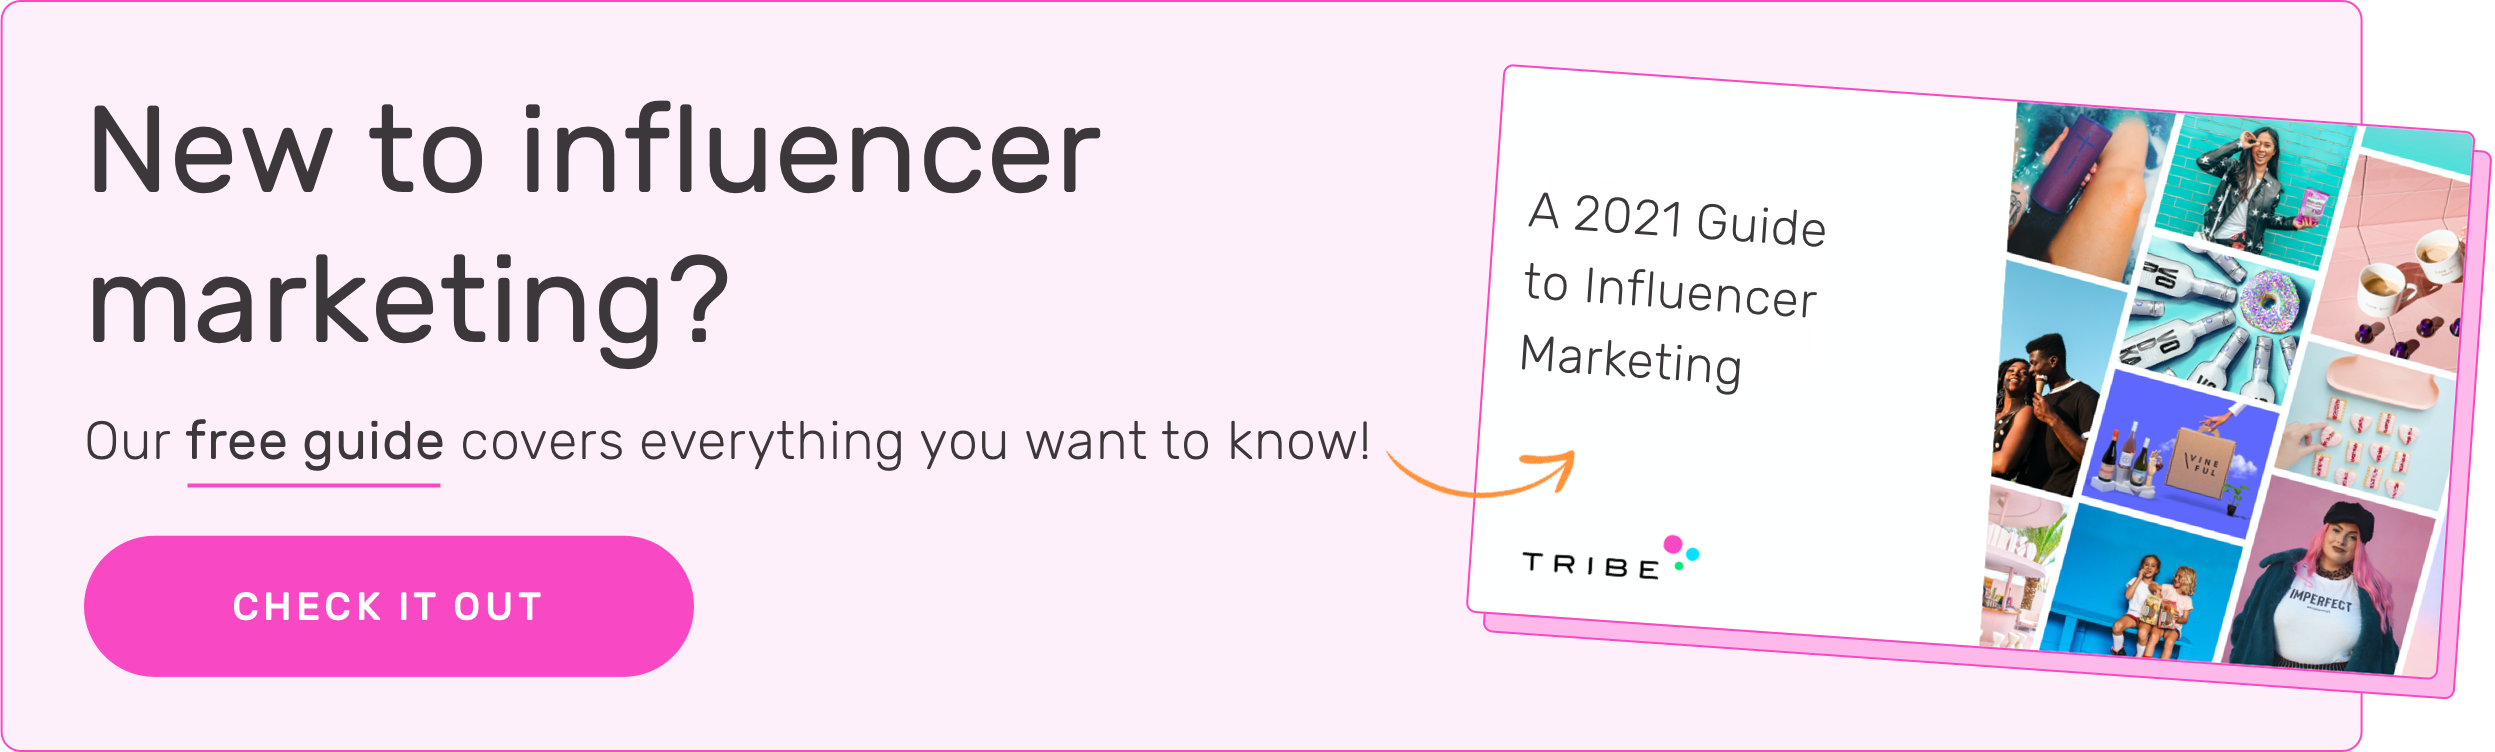 a 2021 guide to influencer marketing